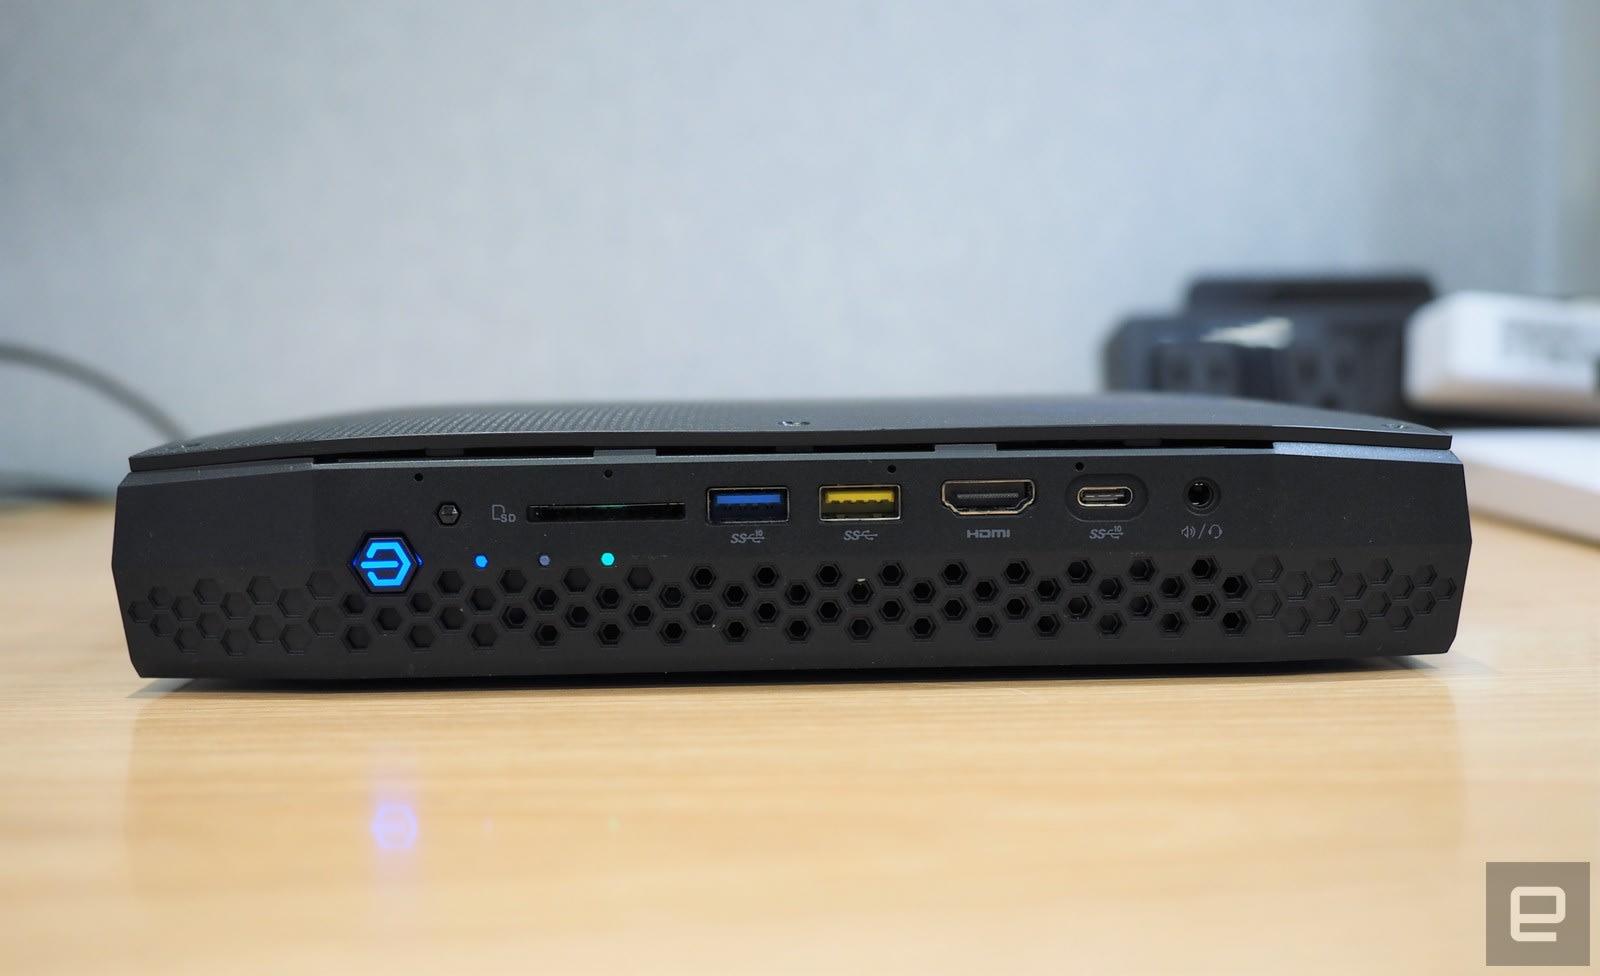 Settin Intel I7 Nuc Review - Wyomingvalleysportshot